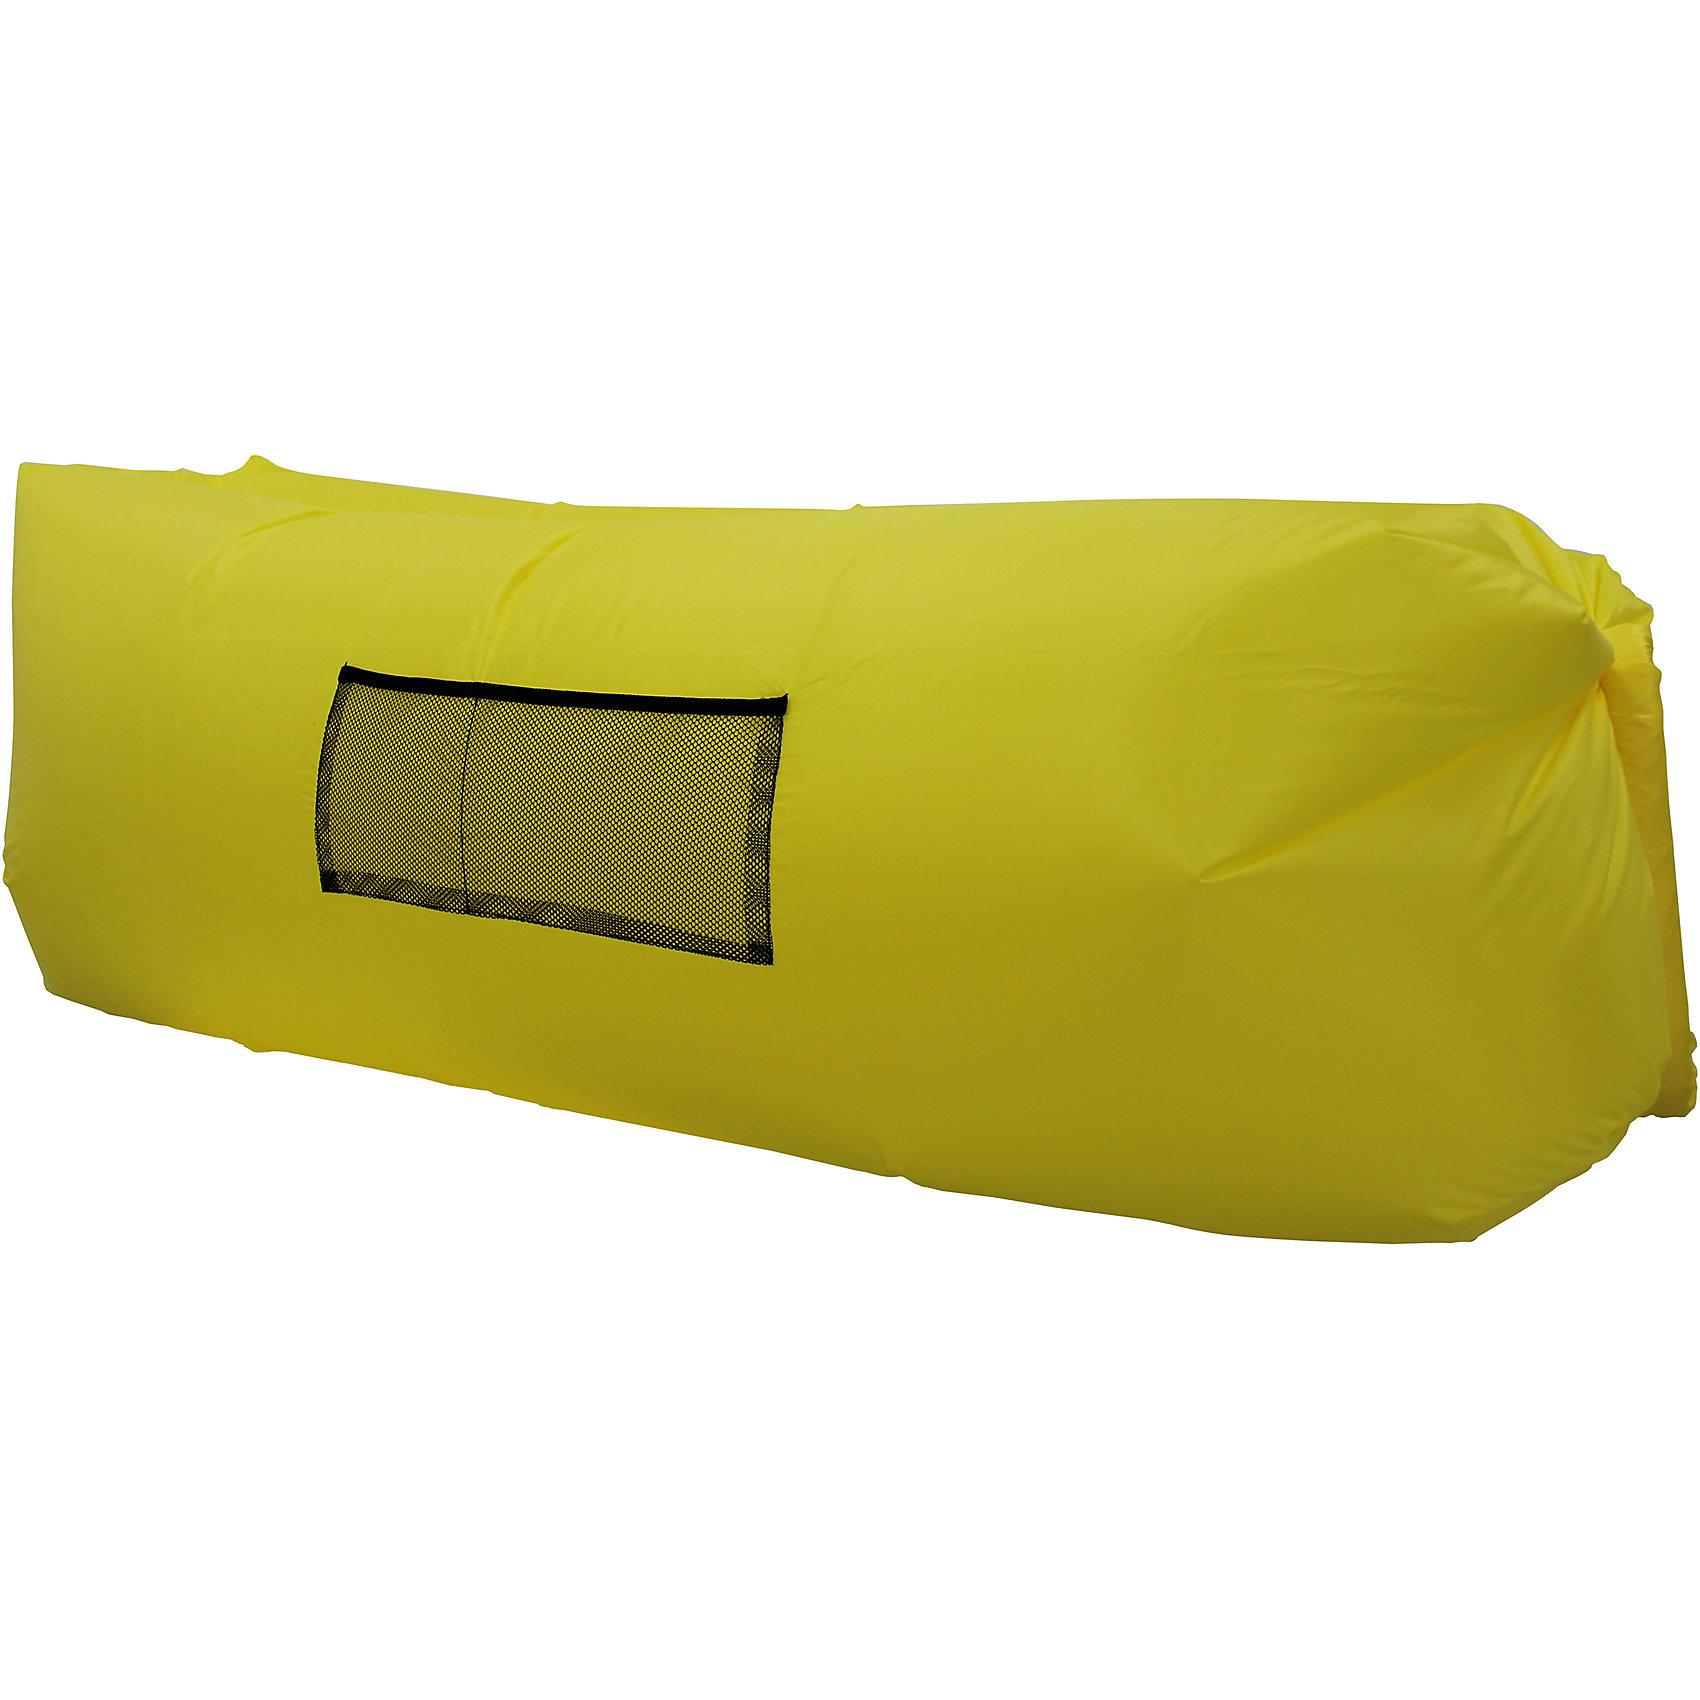 Надувной лежак, желтыйМебель<br><br><br>Ширина мм: 2200<br>Глубина мм: 1400<br>Высота мм: 650<br>Вес г: 1300<br>Возраст от месяцев: 36<br>Возраст до месяцев: 2147483647<br>Пол: Унисекс<br>Возраст: Детский<br>SKU: 6846209